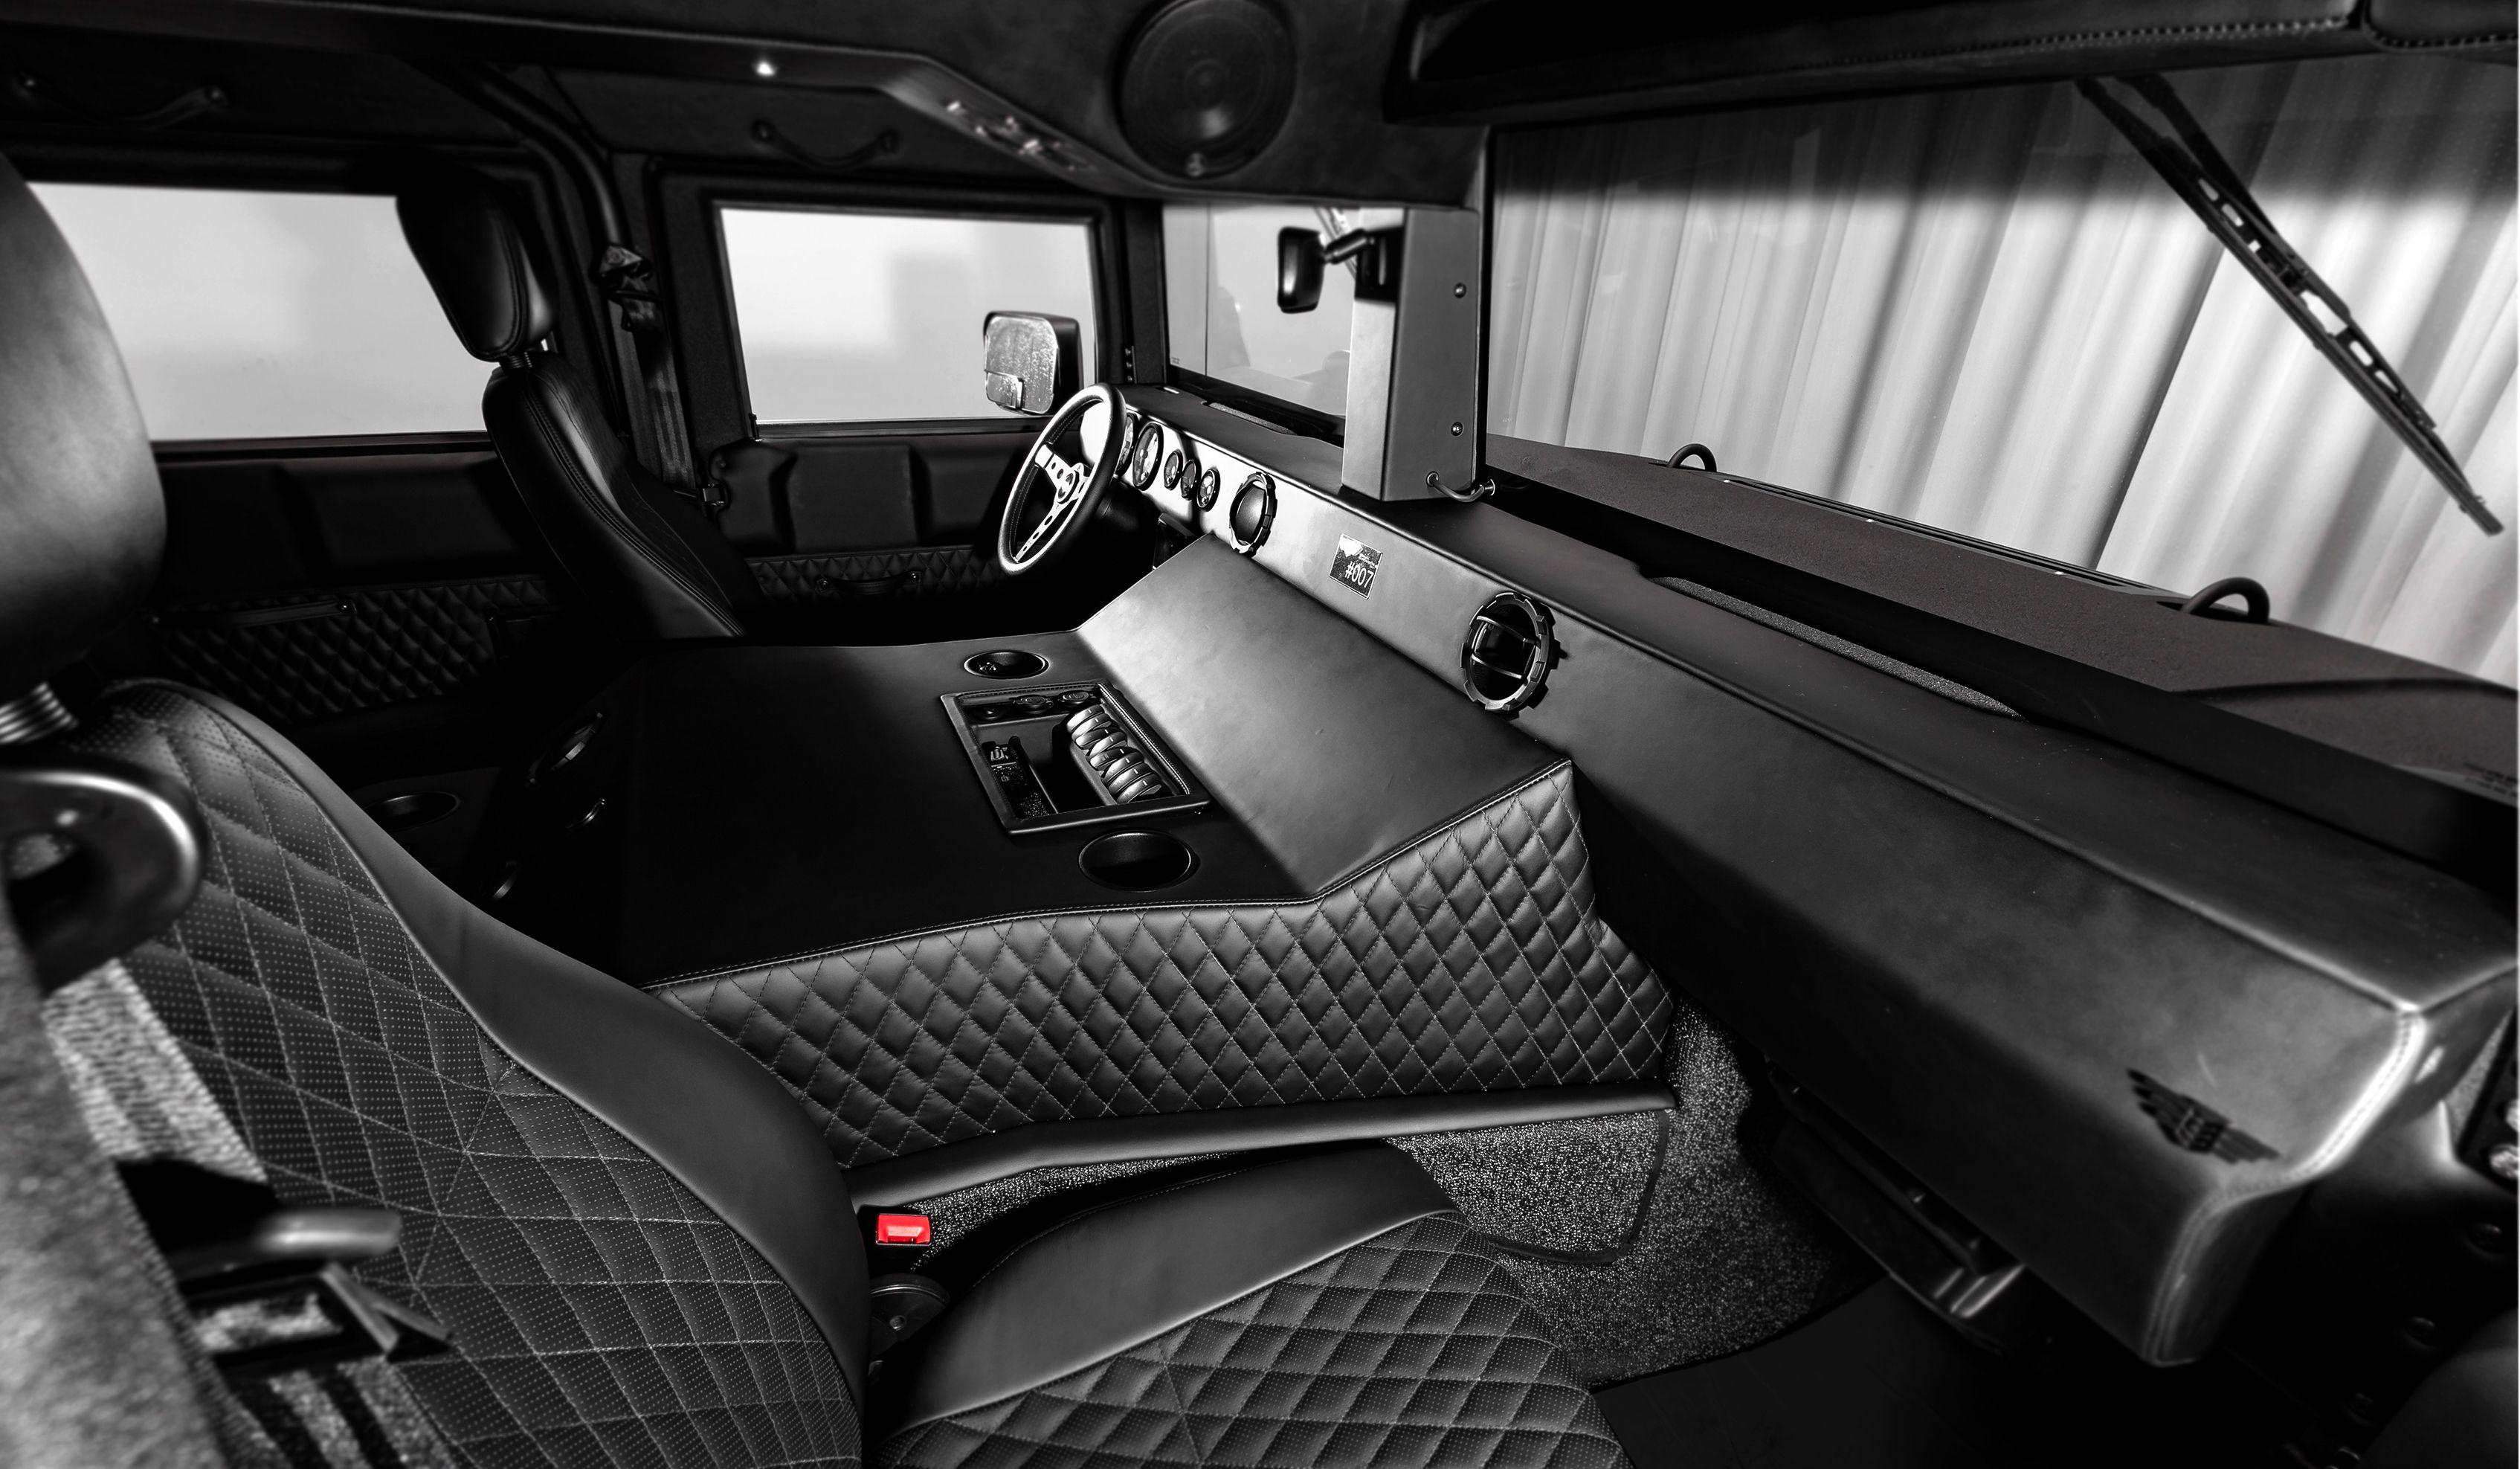 Mil-Spec-Hummer-H1-pickup-hardtot-launch-edition-2019-8